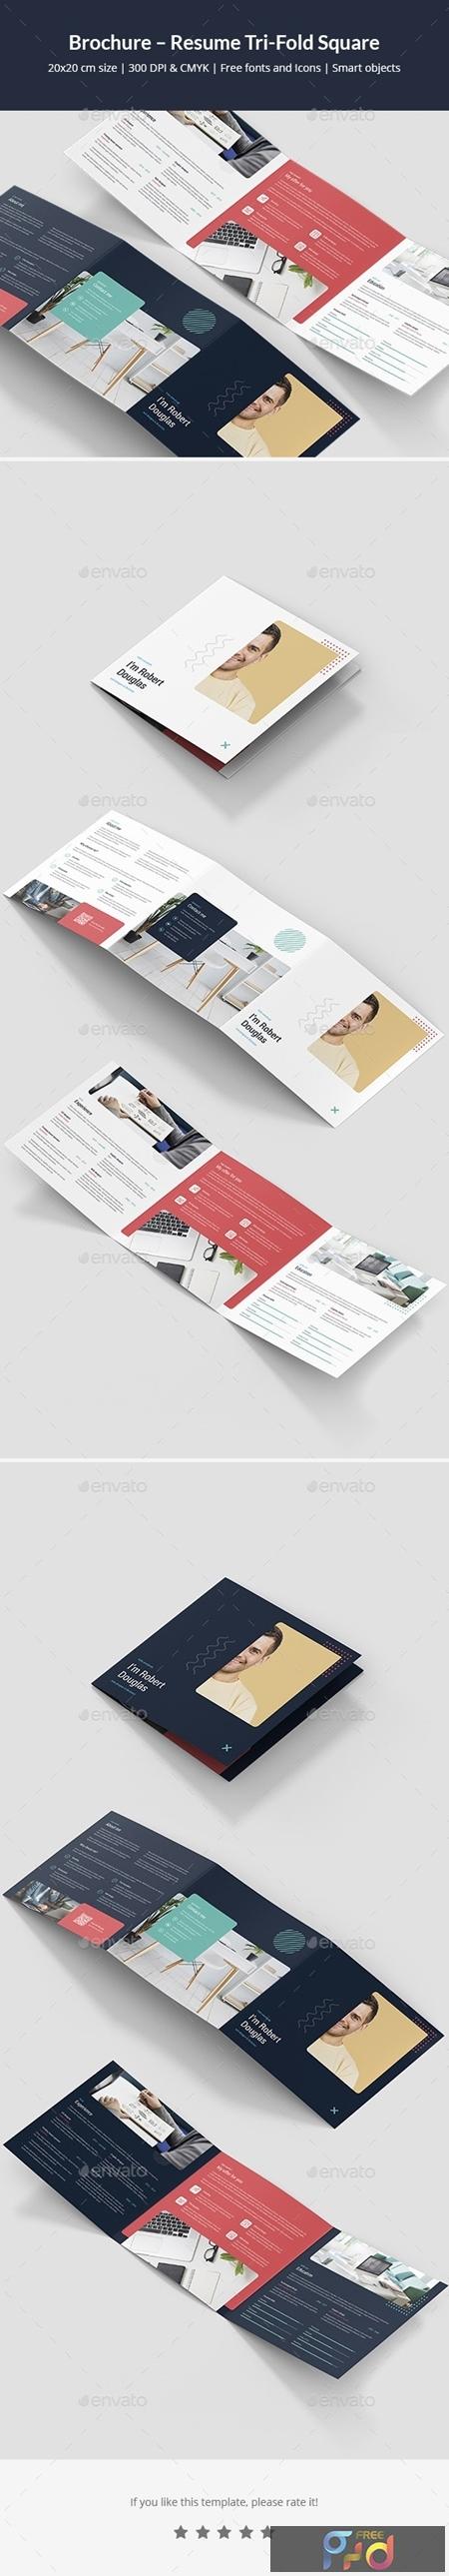 Brochure – Resume Tri-Fold Square 24770880 1